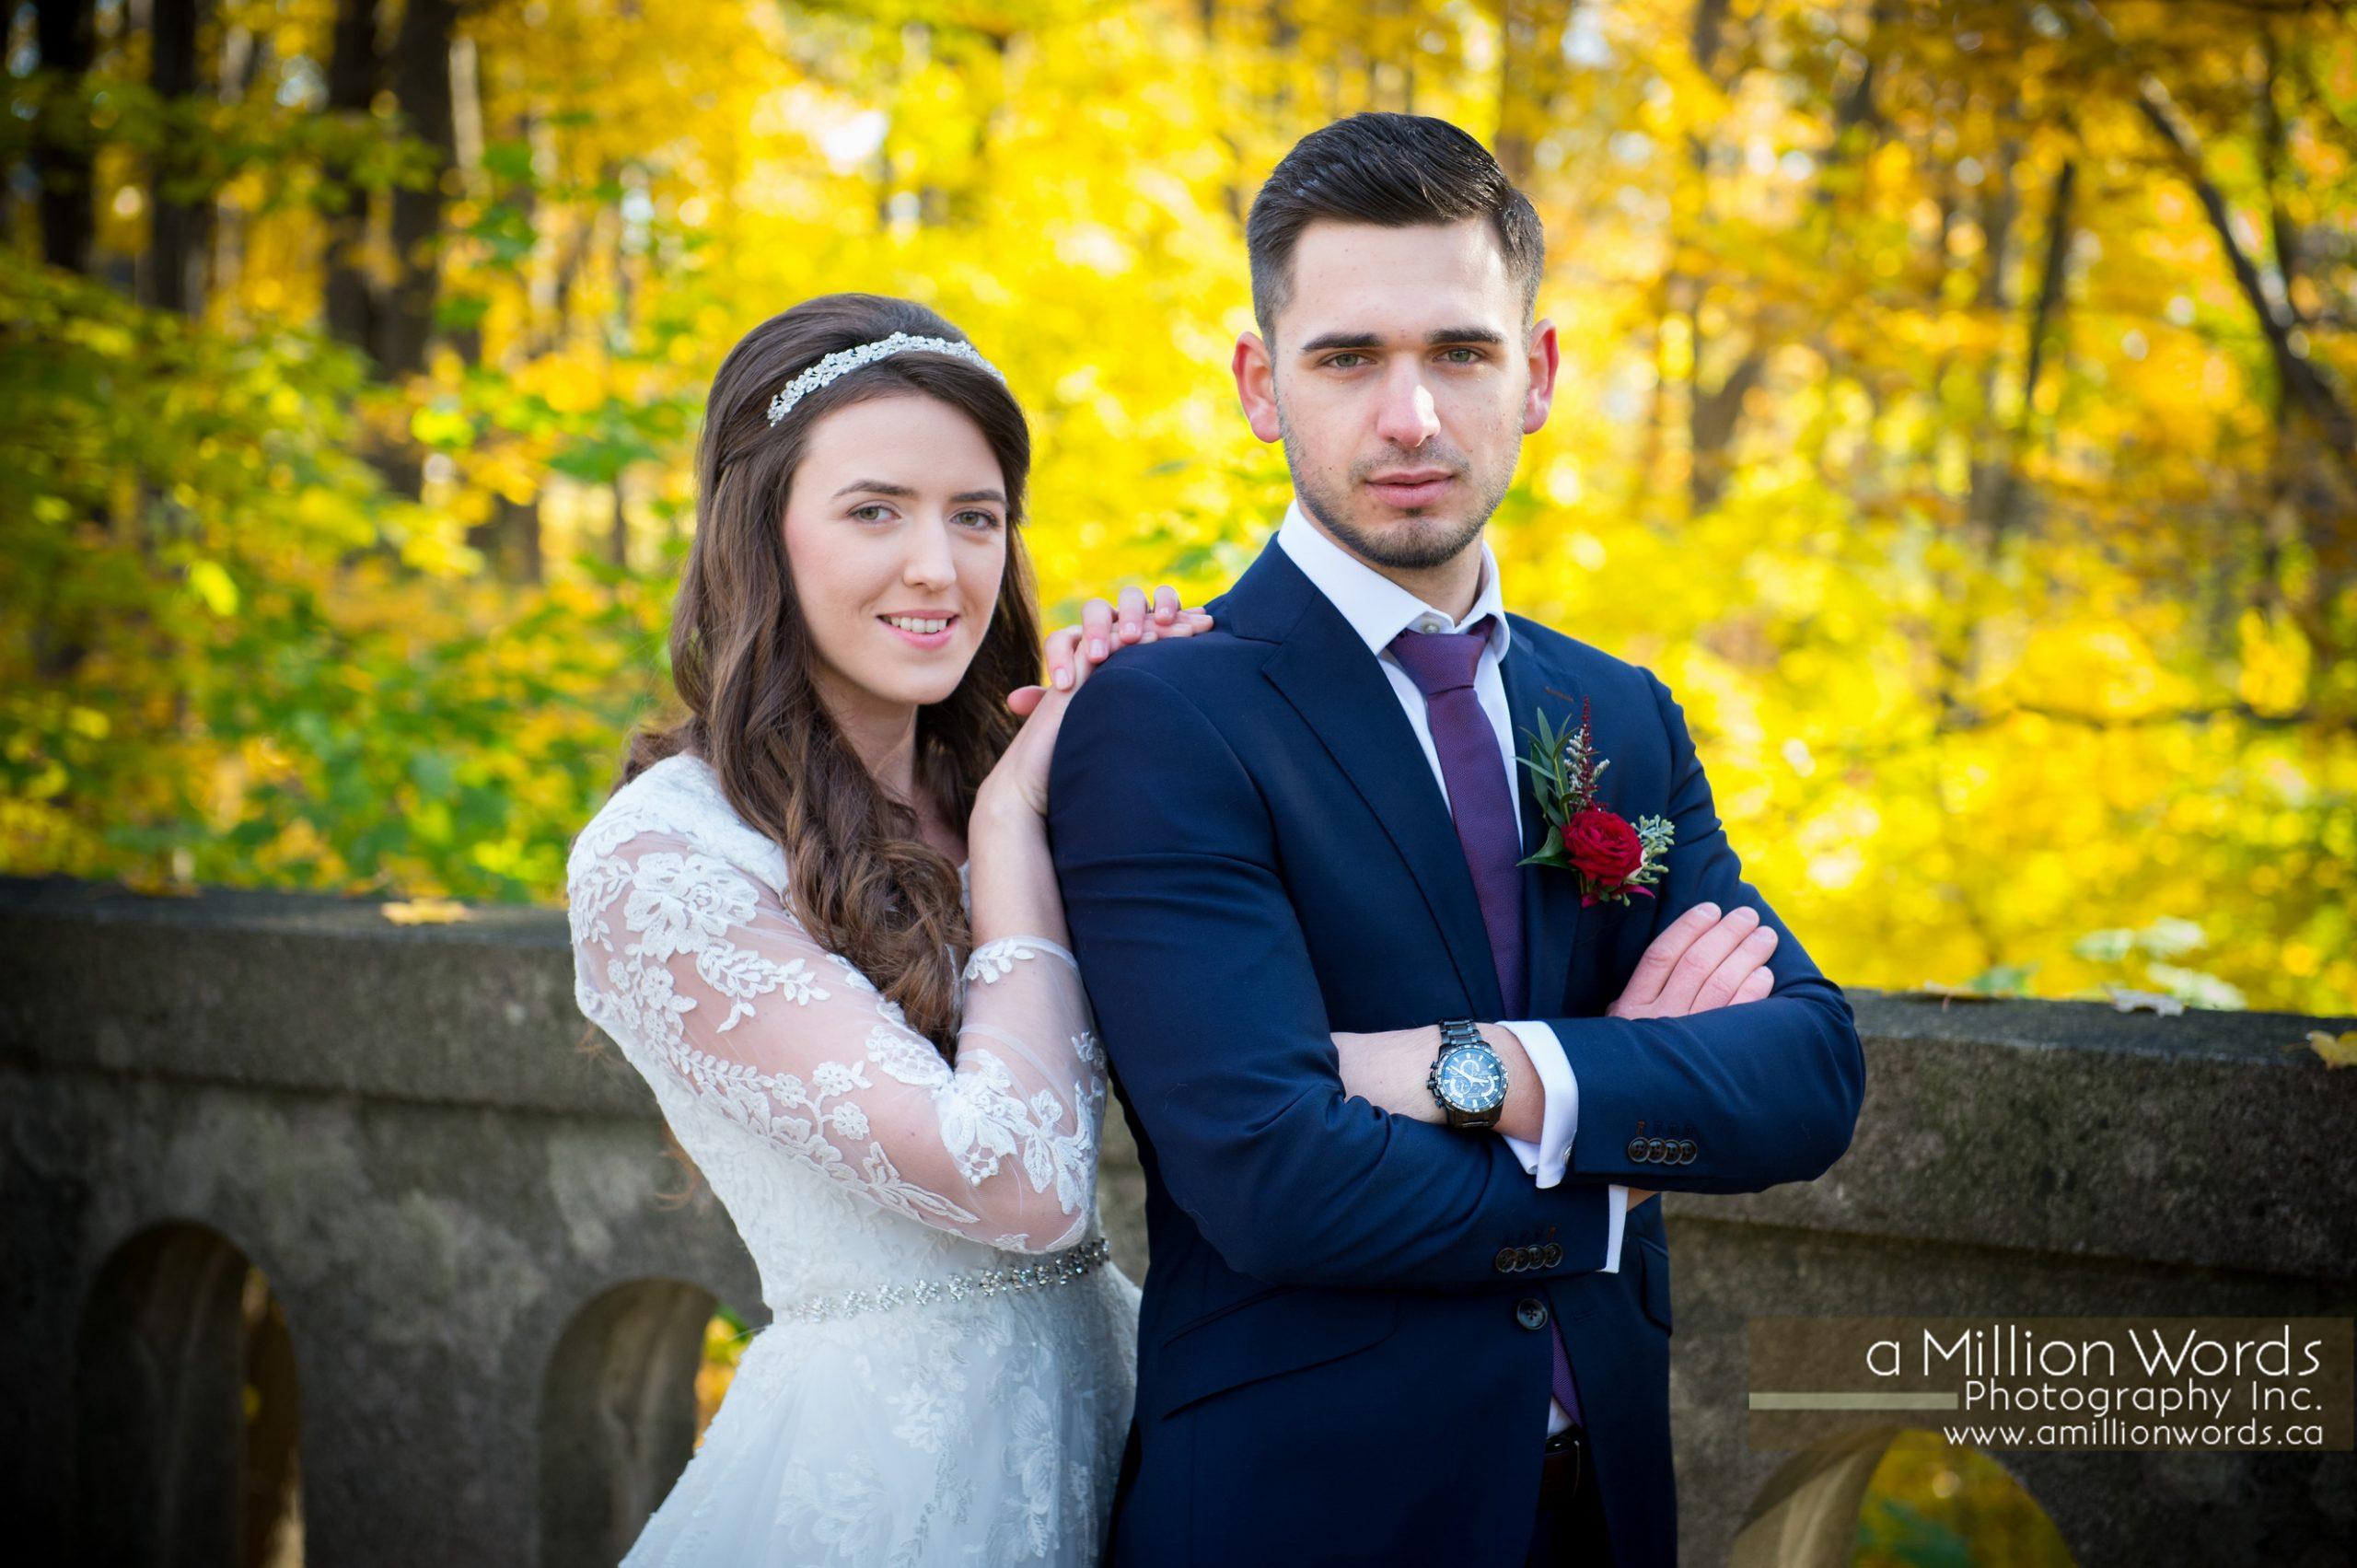 cambridge_afternoon_wedding_photography16